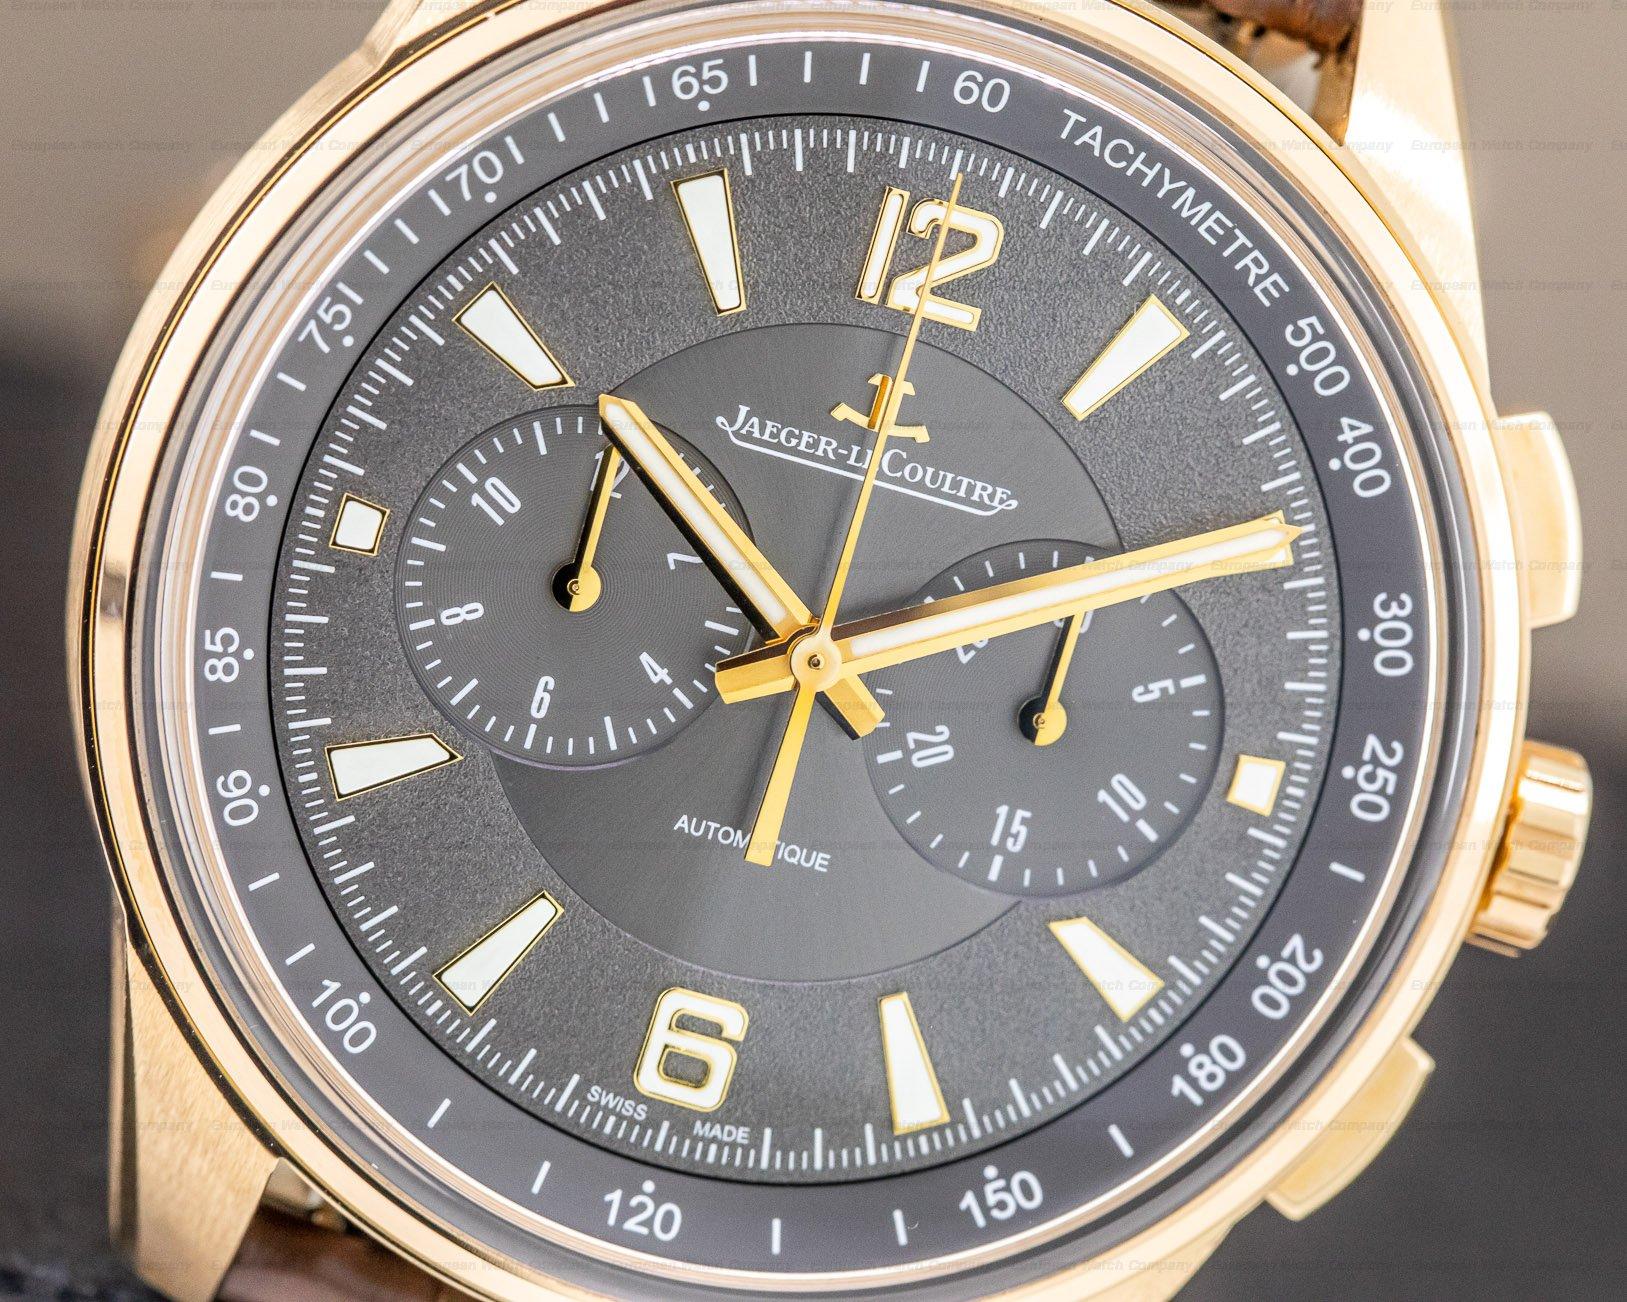 Jaeger LeCoultre Q9022450 Polaris Chronograph 18k Rose Gold / Grey Dial